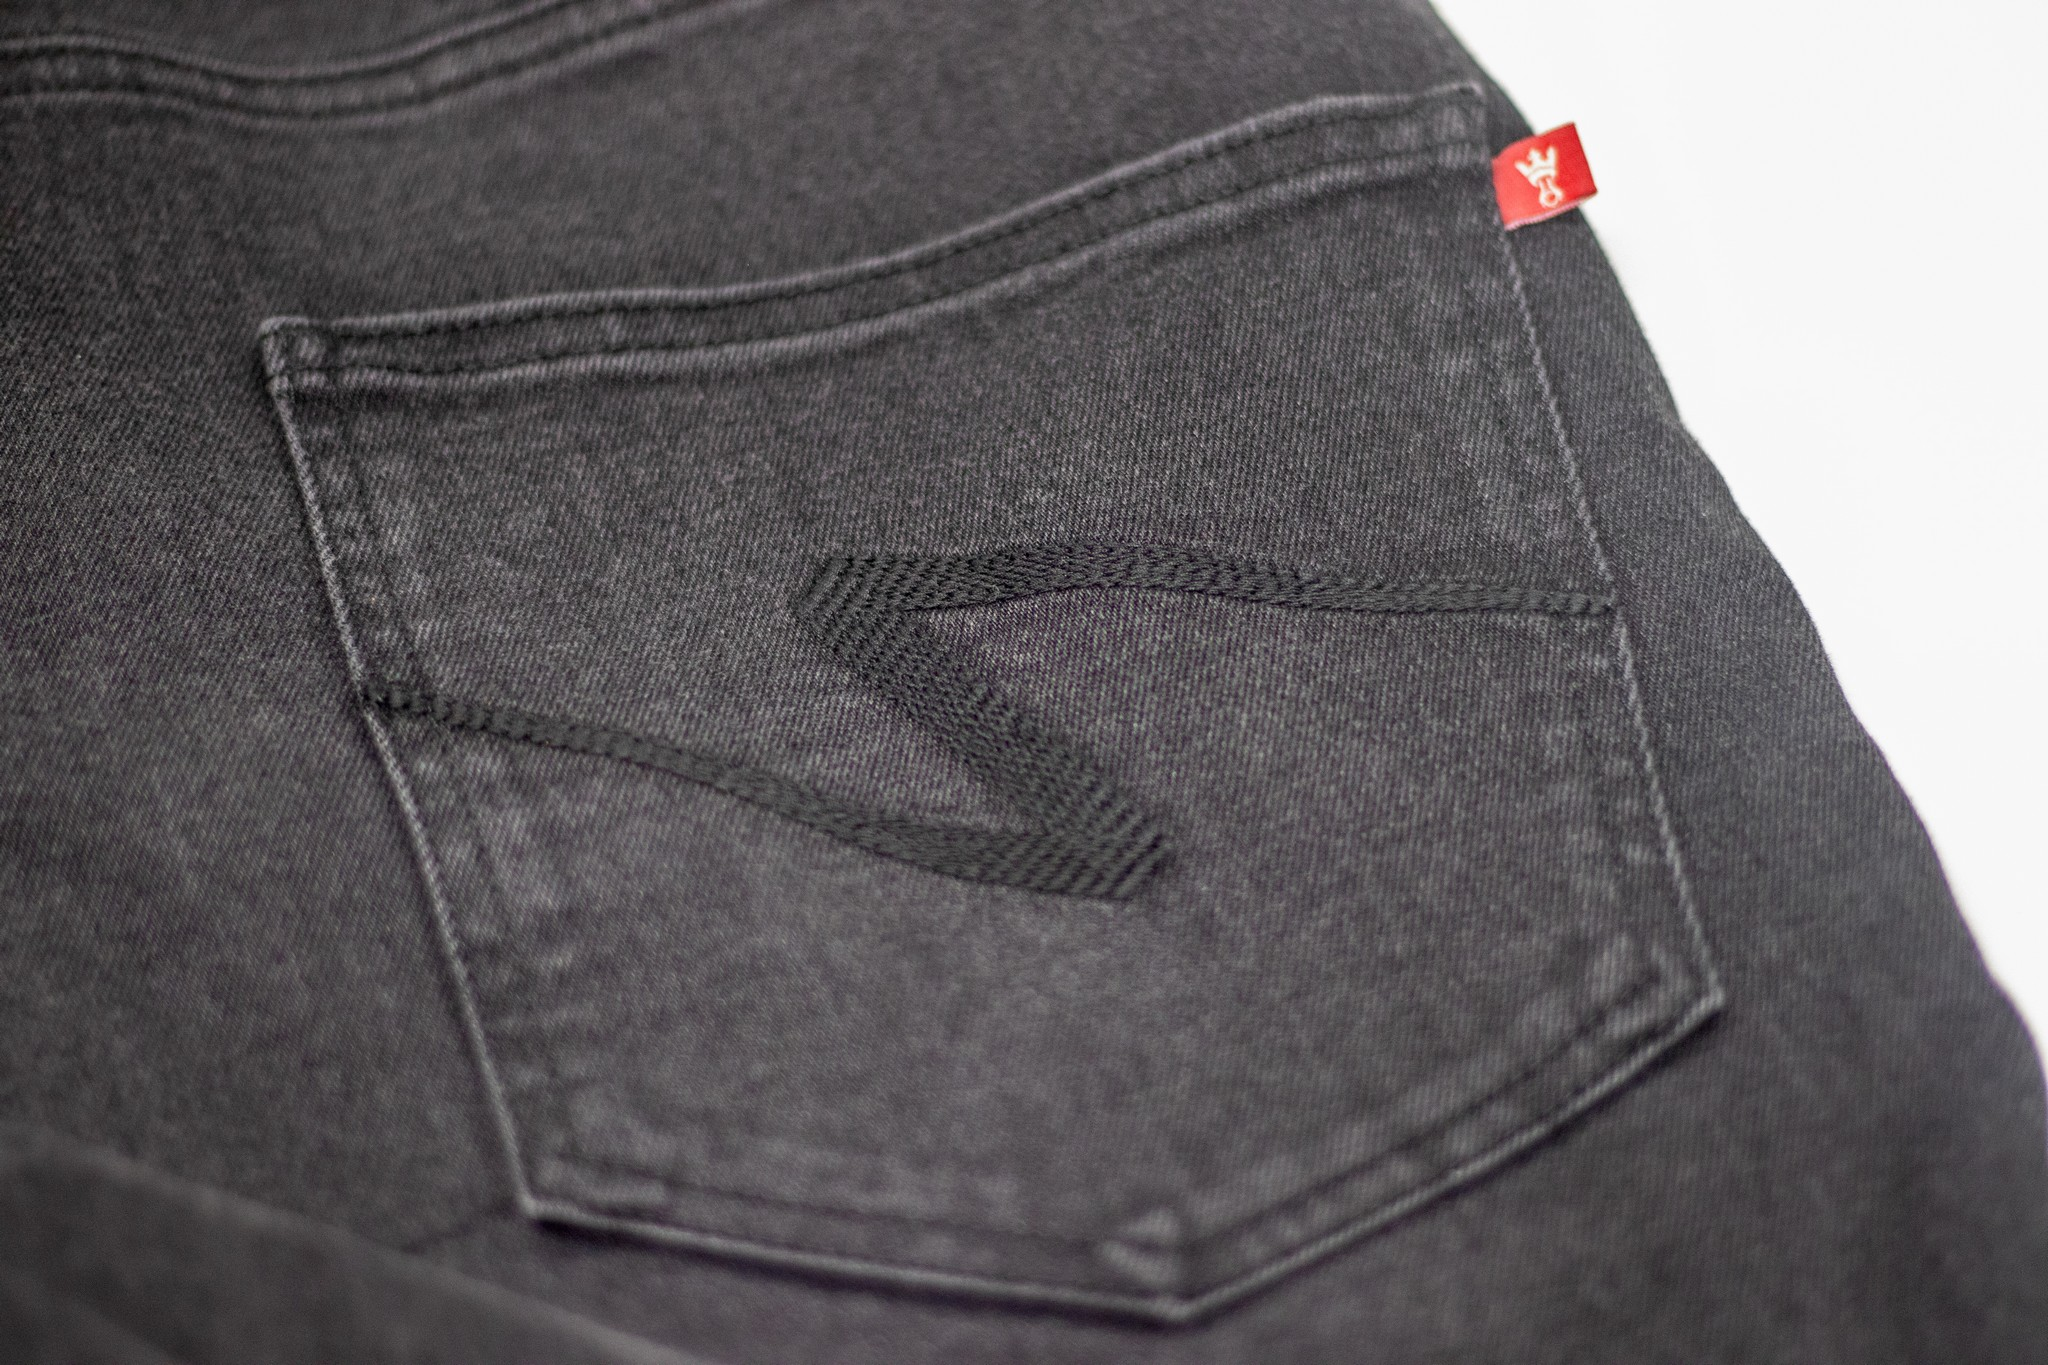 Closeup of rear pocket stitching